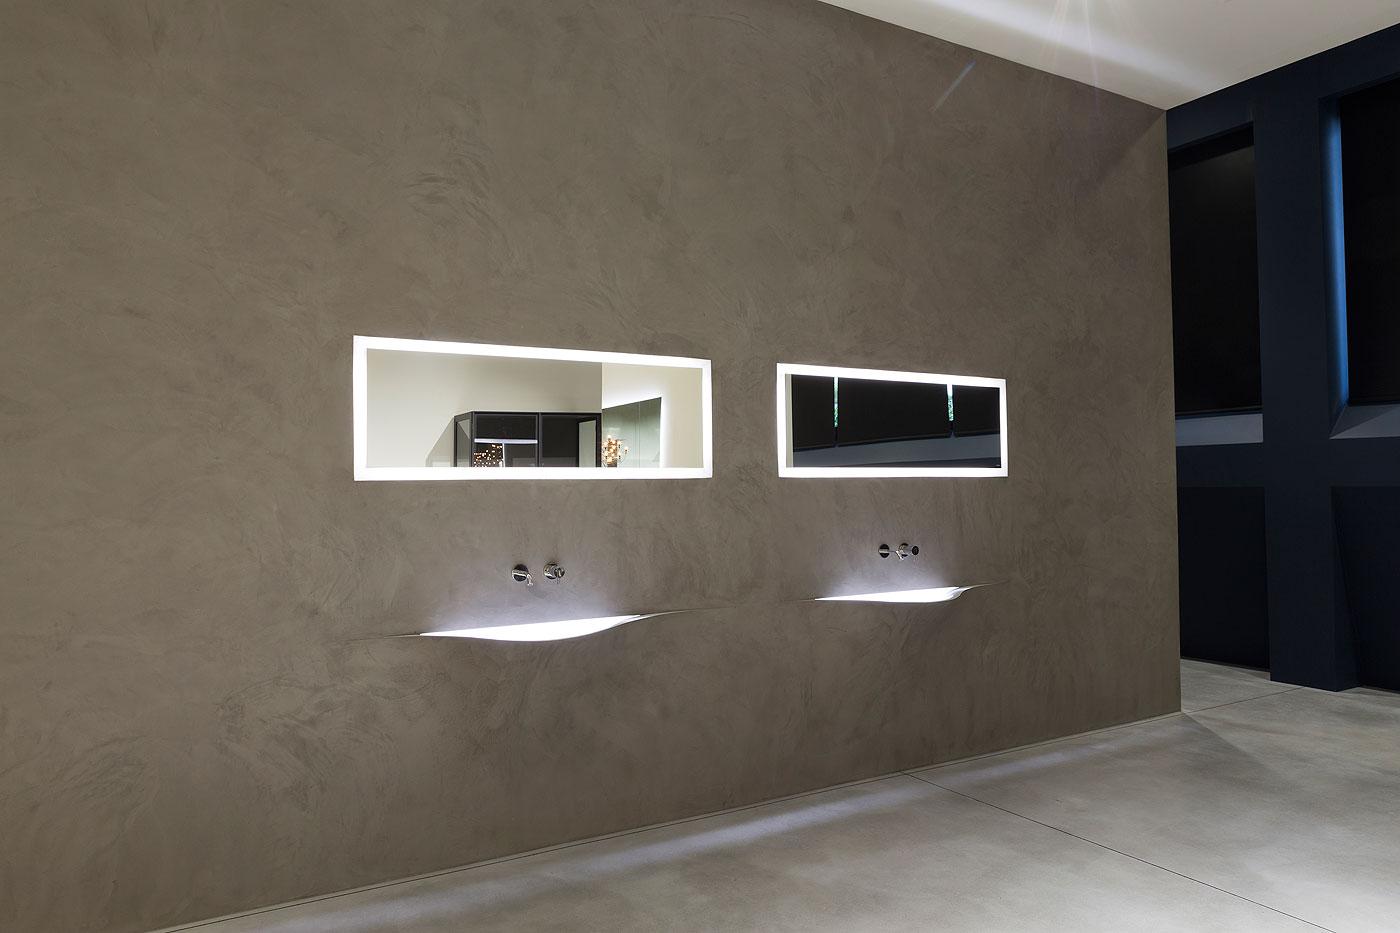 showroom-corporativo-antoniolupi-stabbia (4)